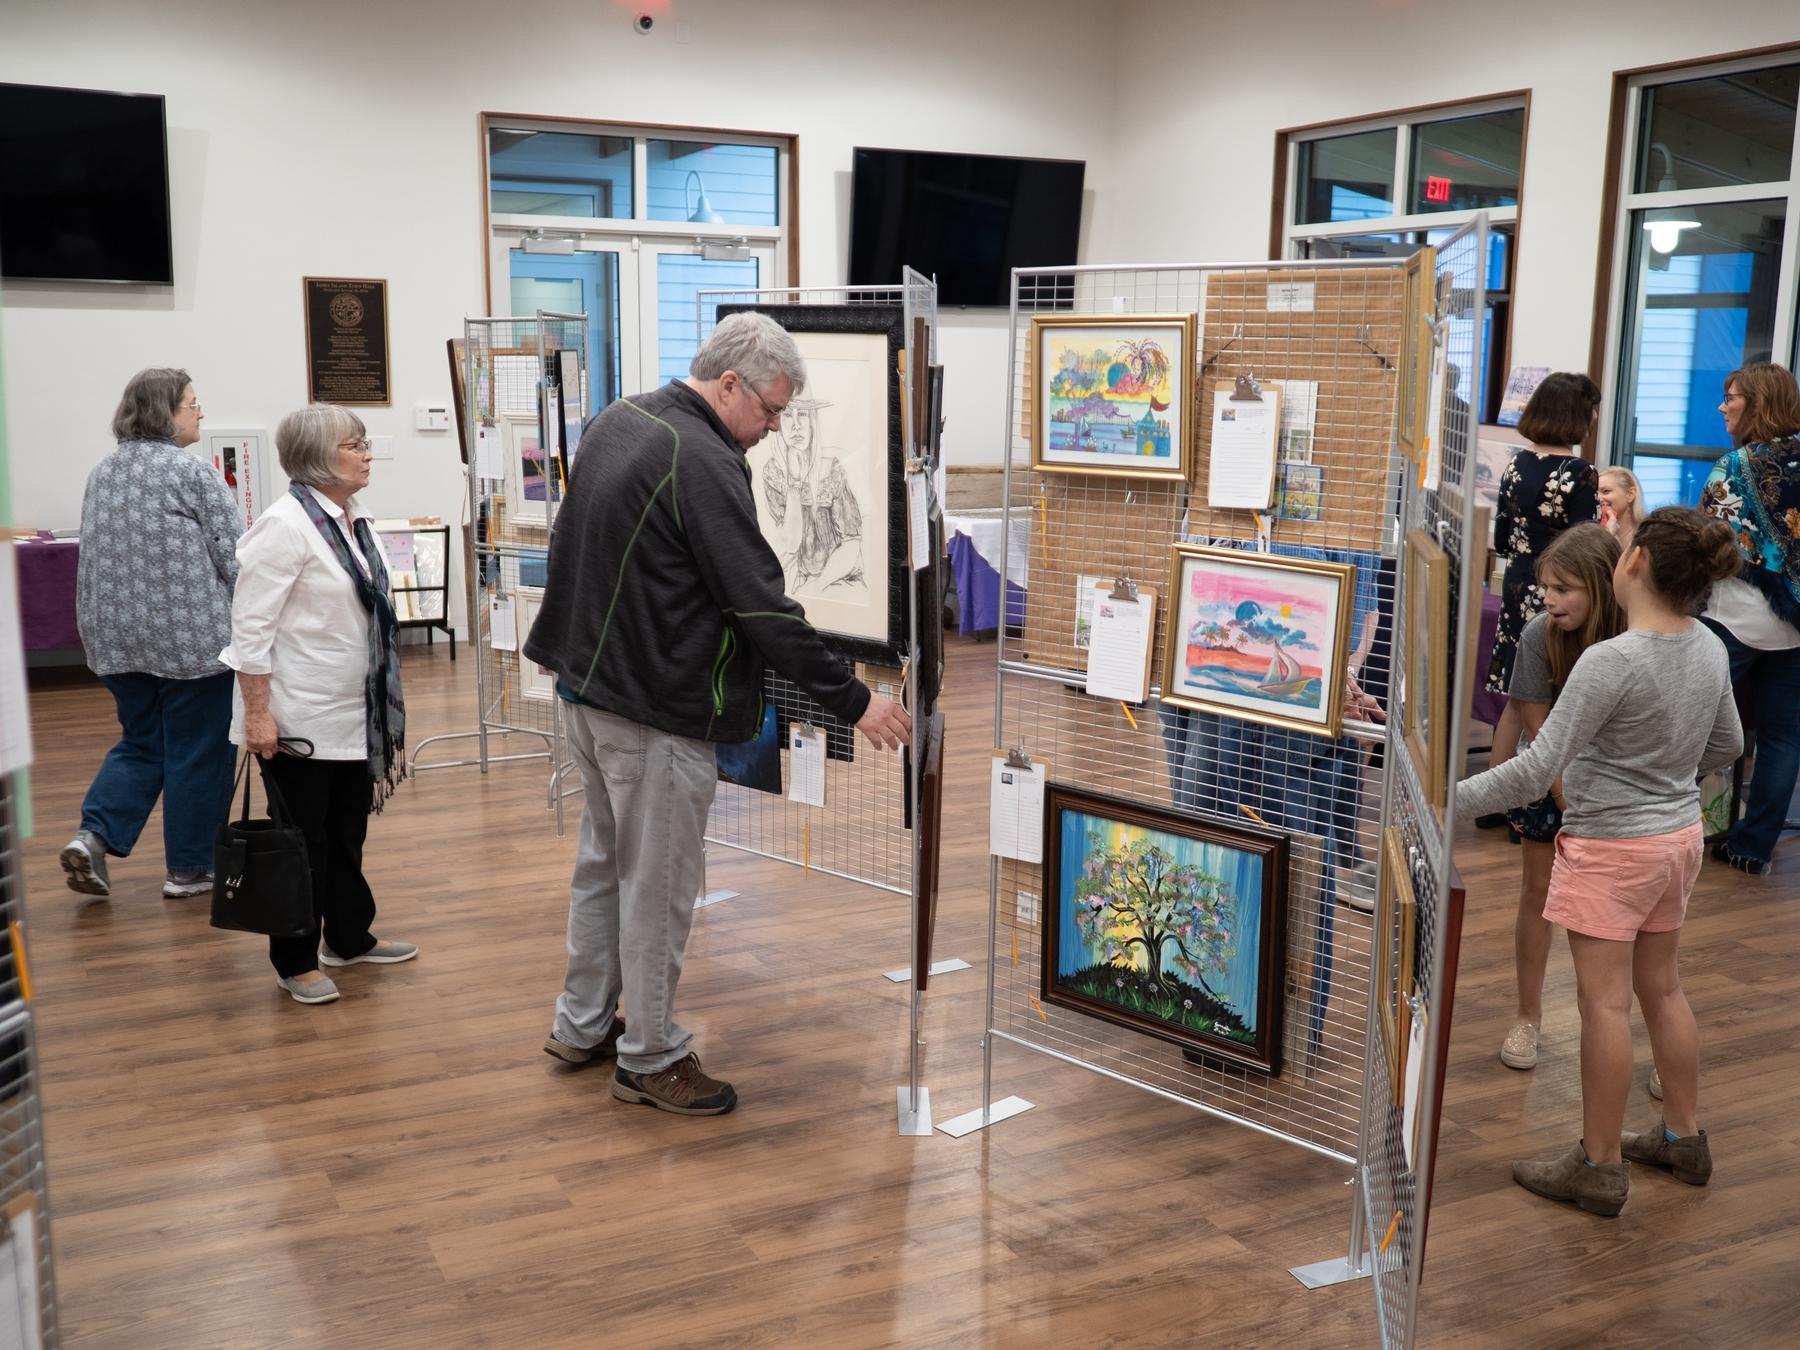 JI_Arts_Auction_2019-08768.jpg